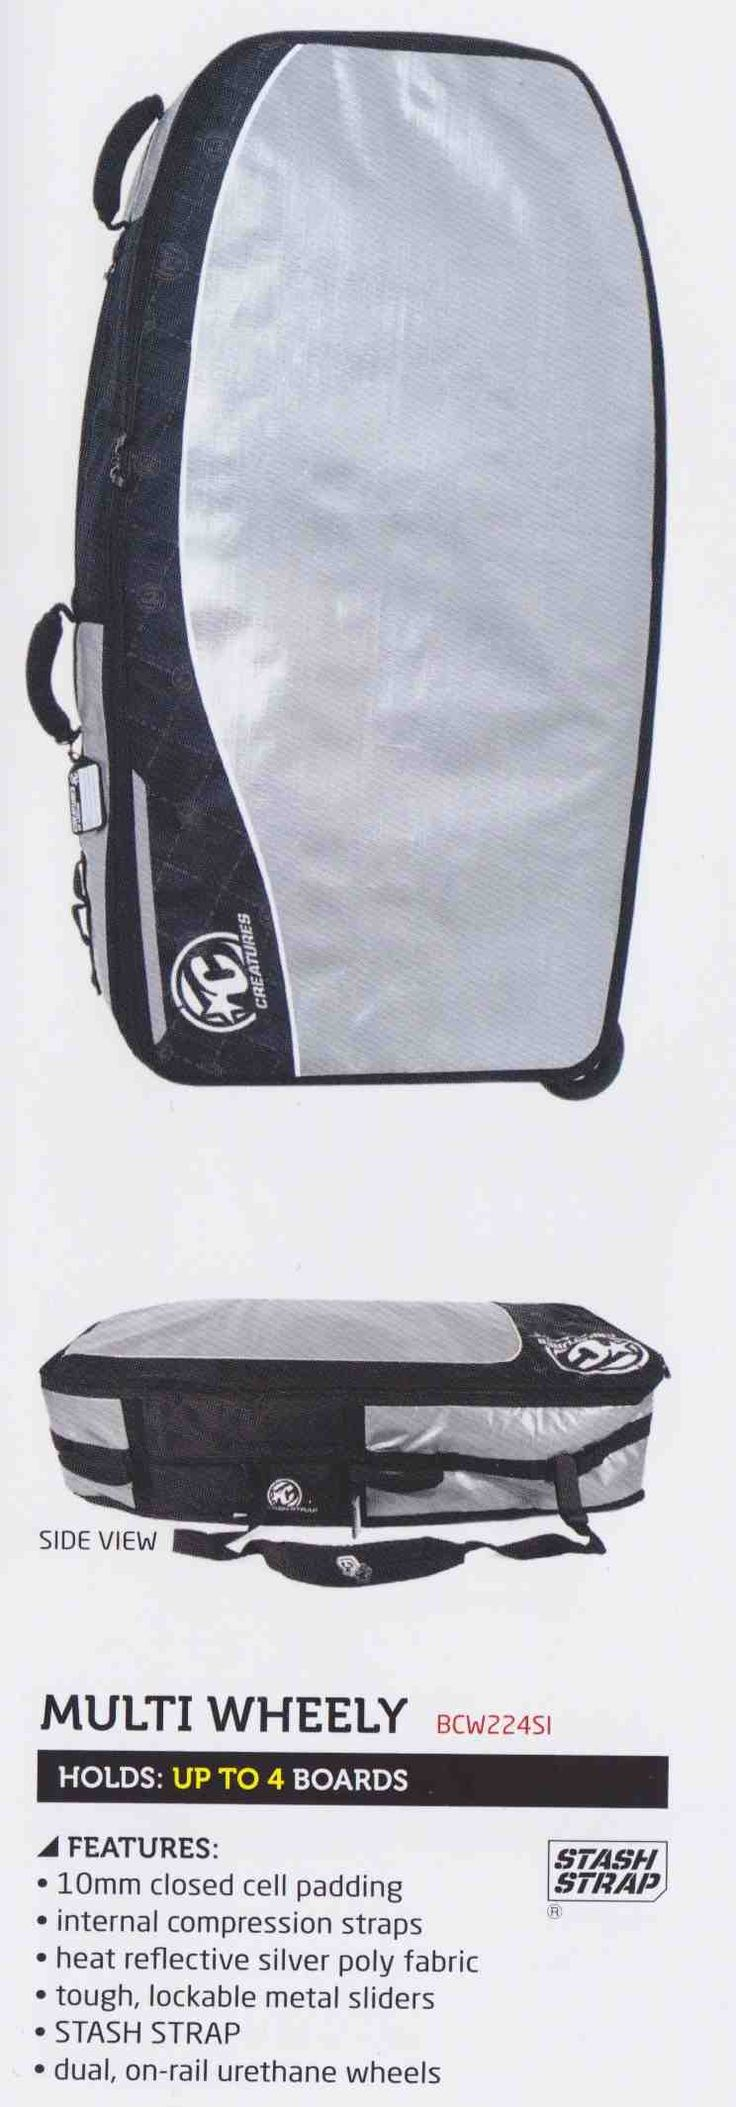 CREATURES OF LEISURE Multi Wheely Boardbag - 2014/15 Range Your Local Bodyboard Shop - Australia & Worldwide